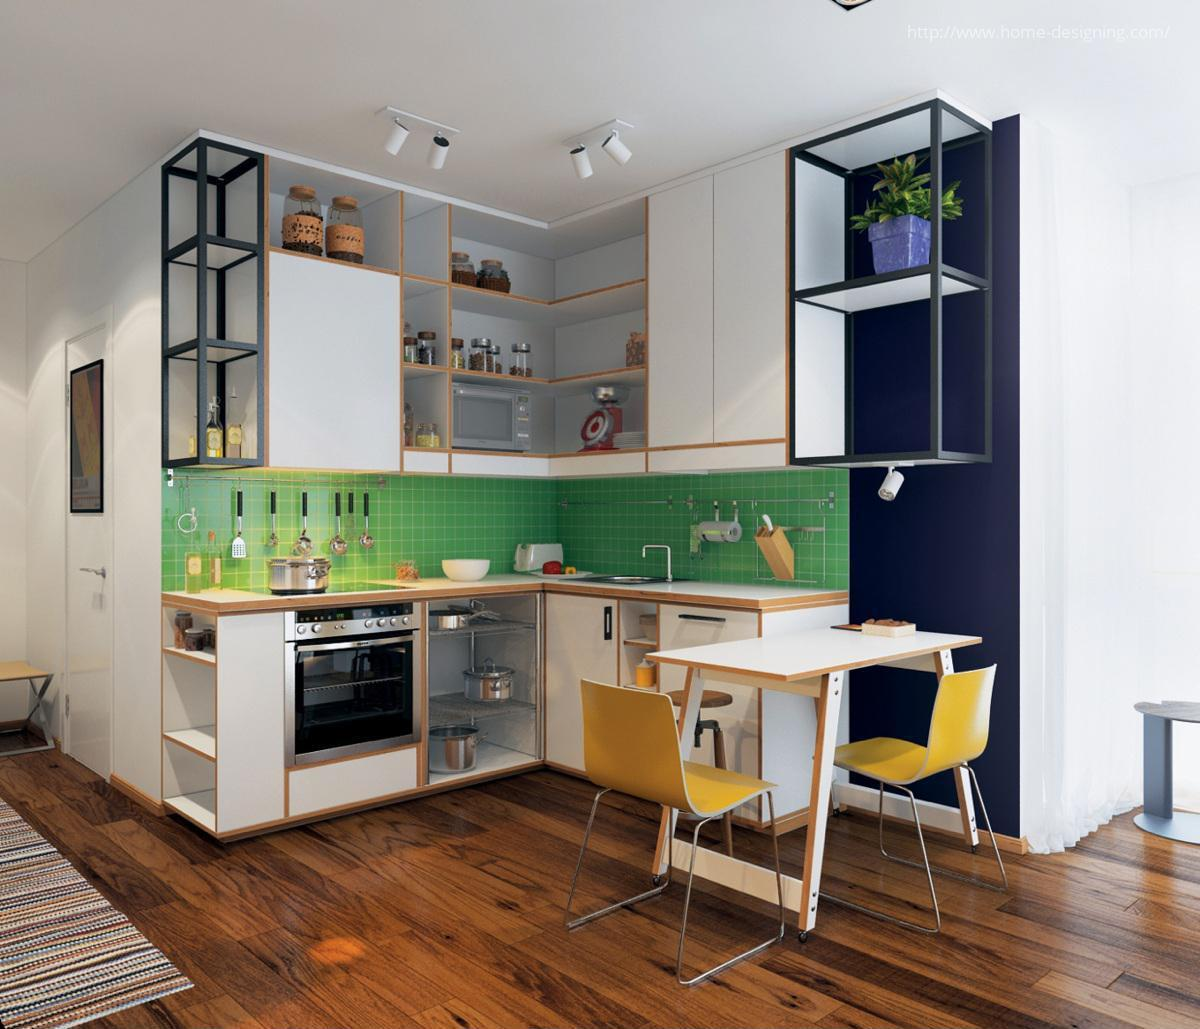 The Best Airbnb Cities For Home Decor Ideas: Színes Konyha